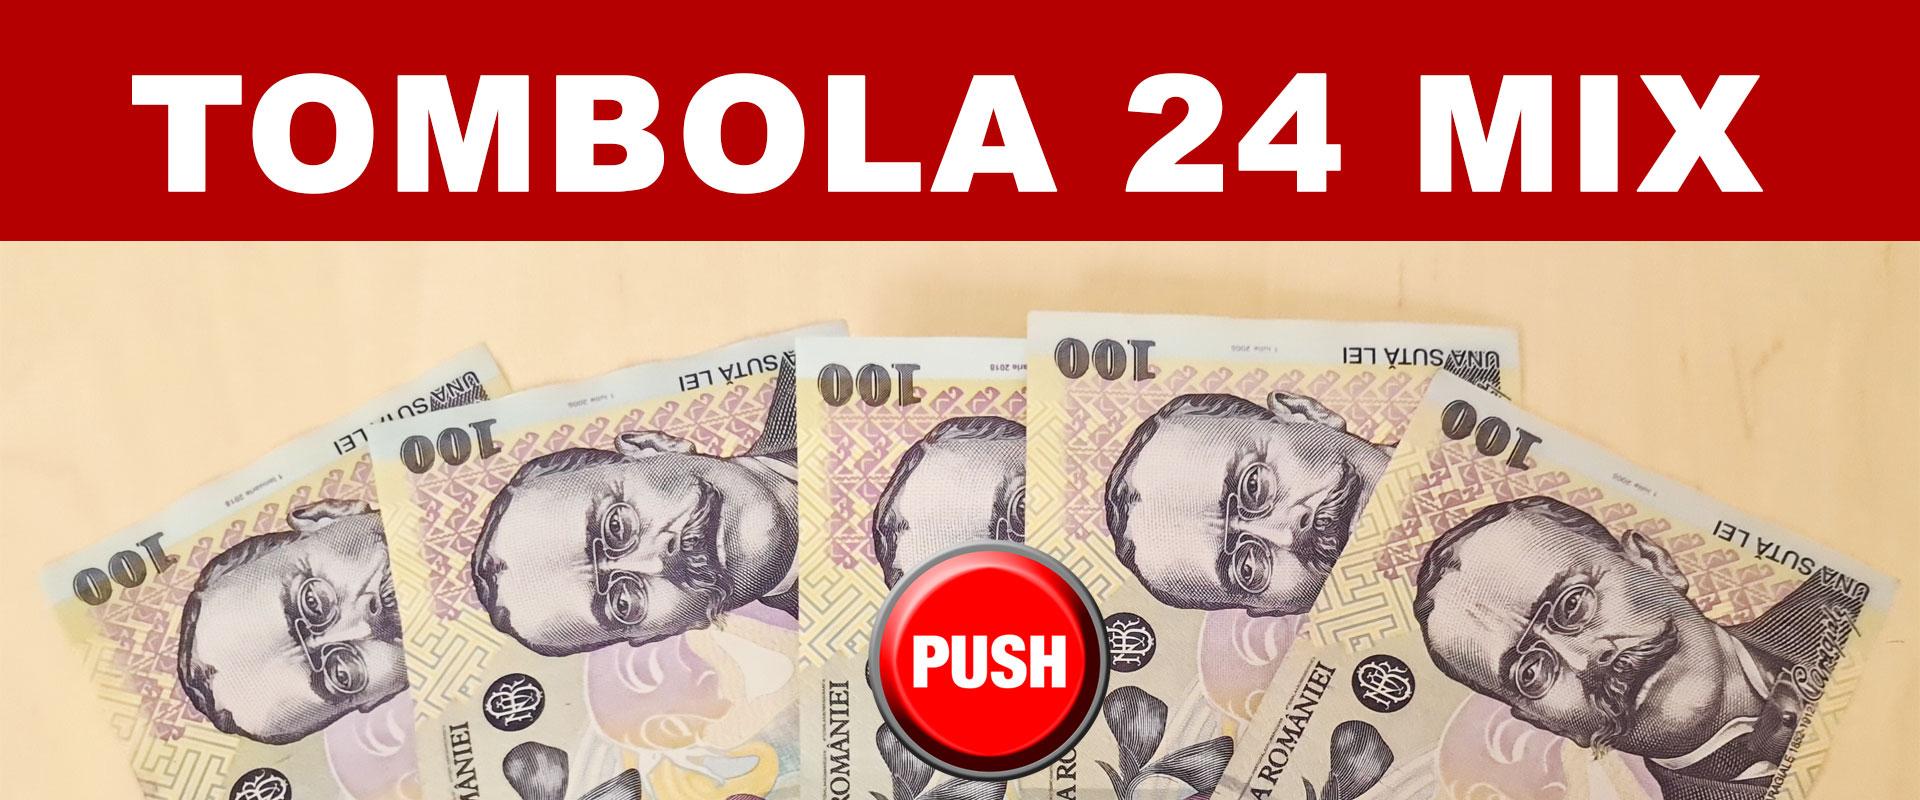 Tombola 24 Mix